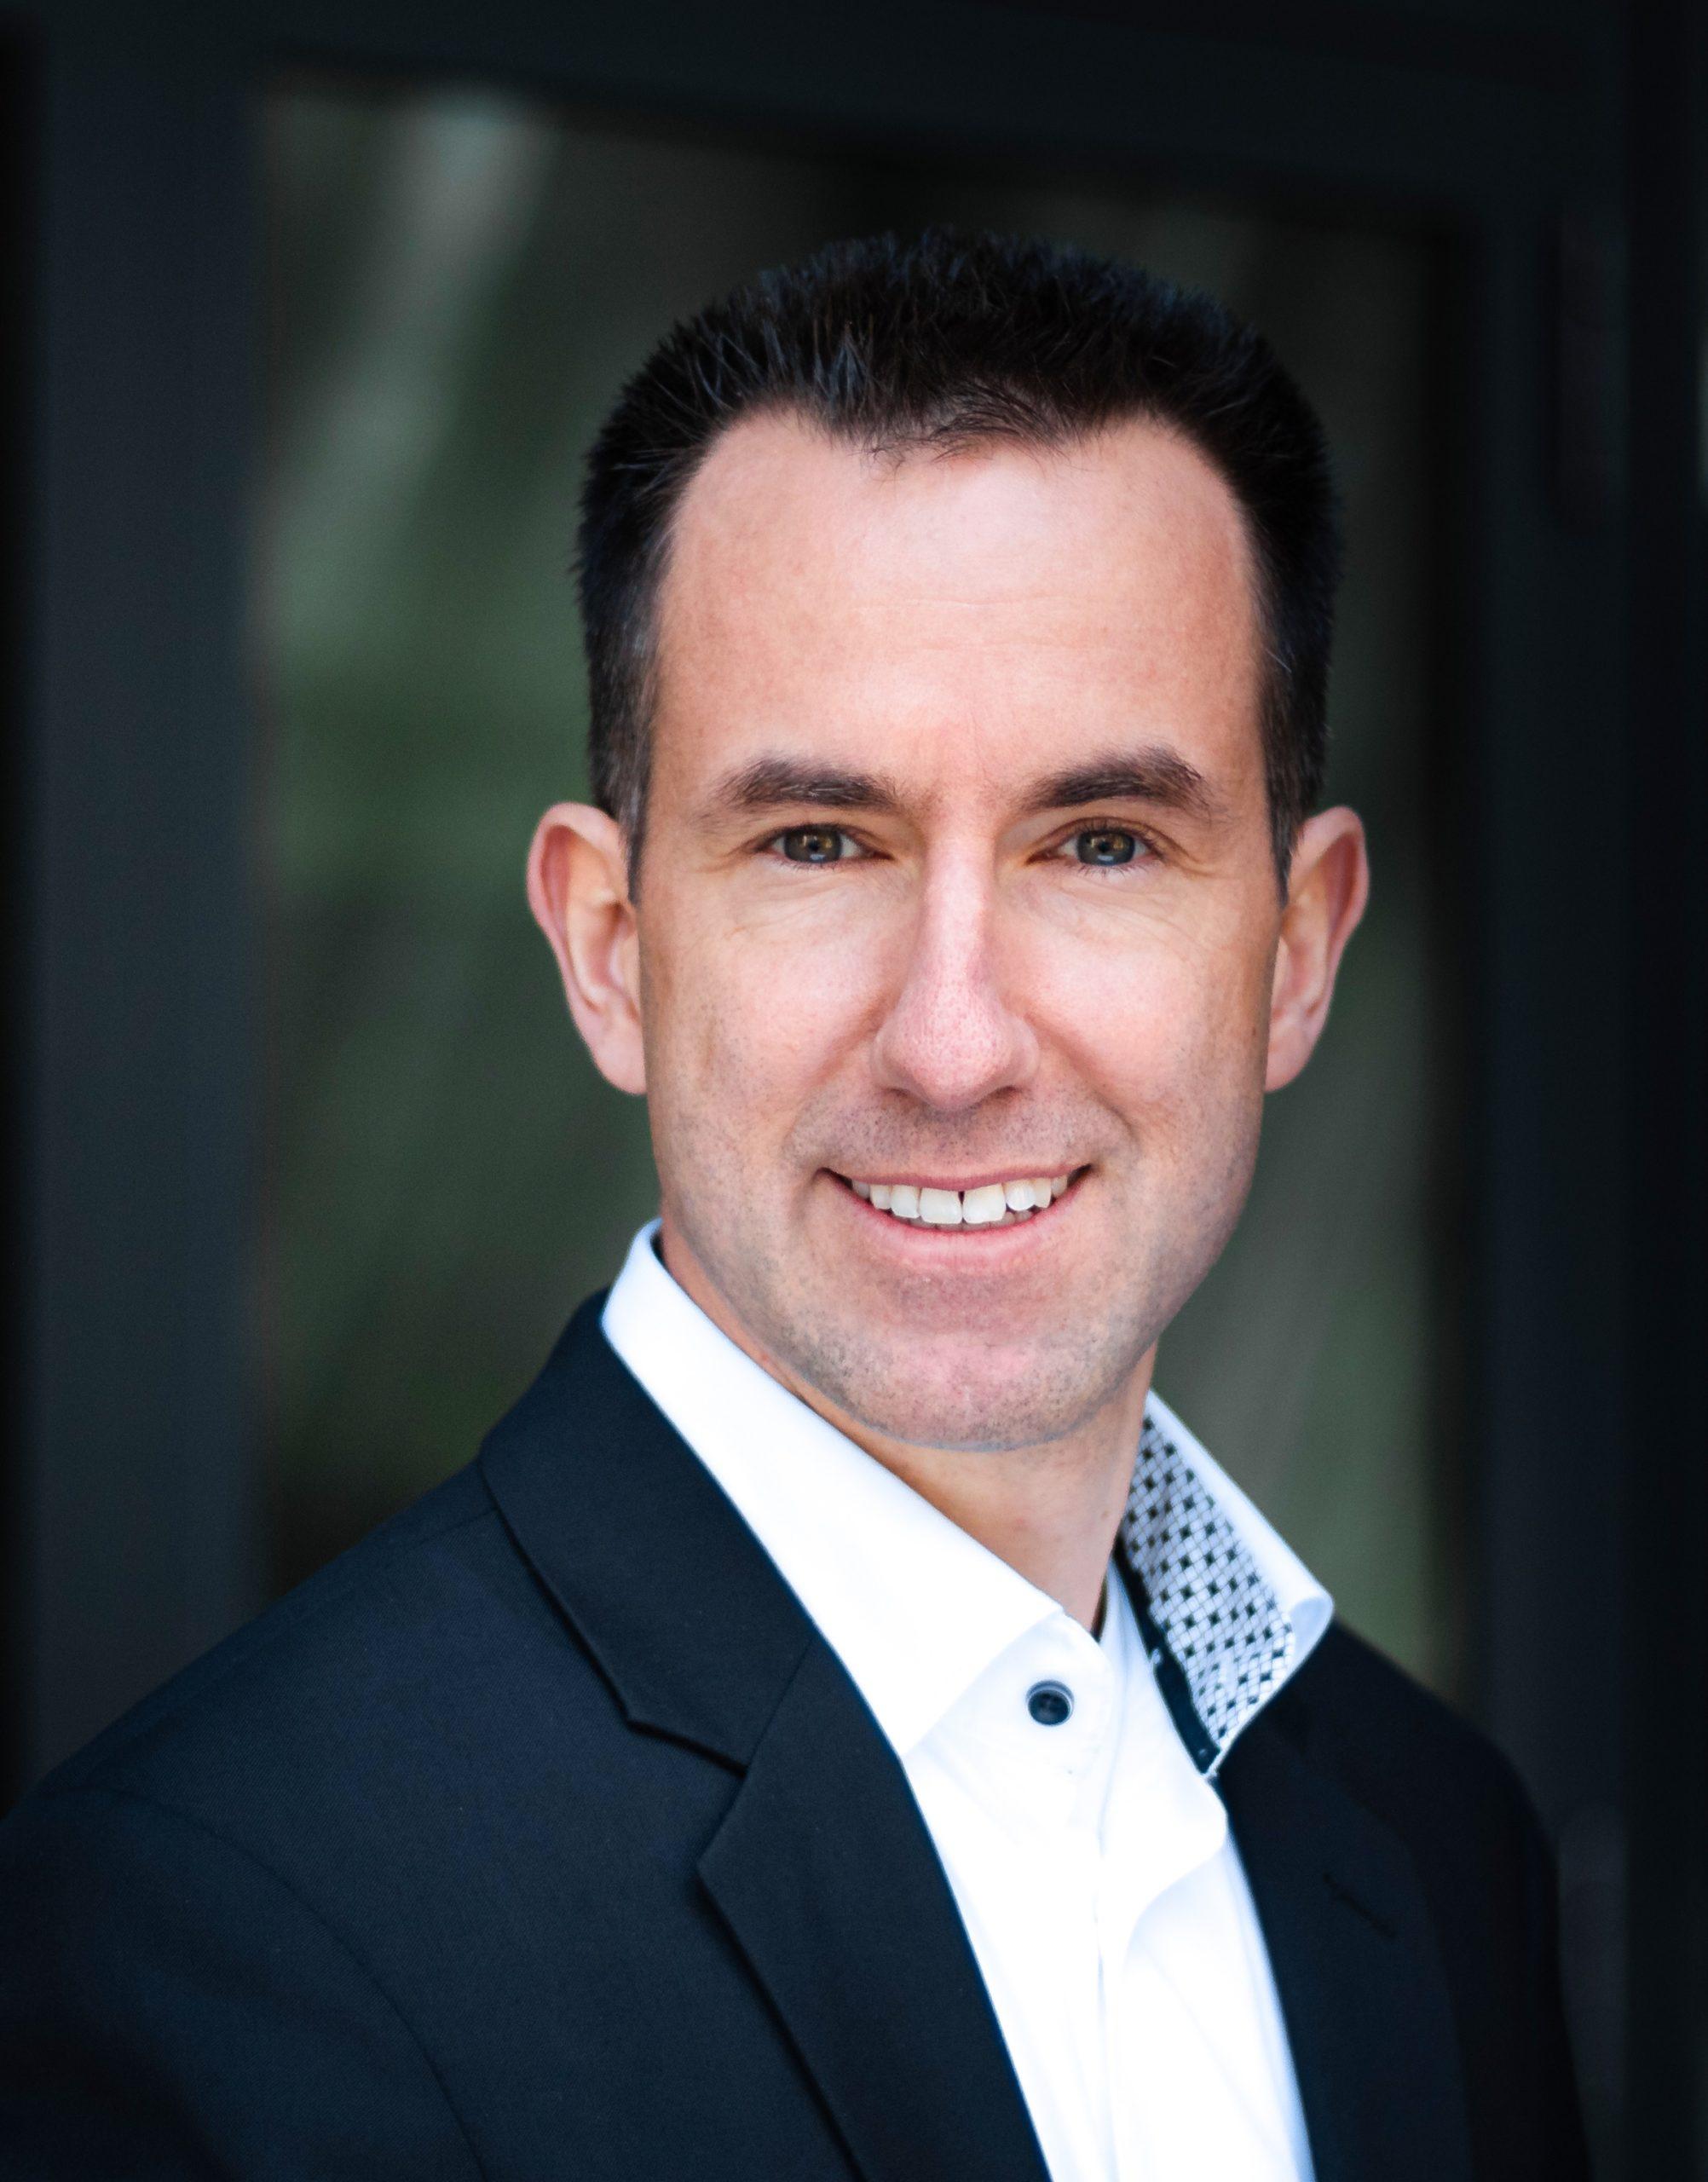 Thomas Buchhart Profilbild